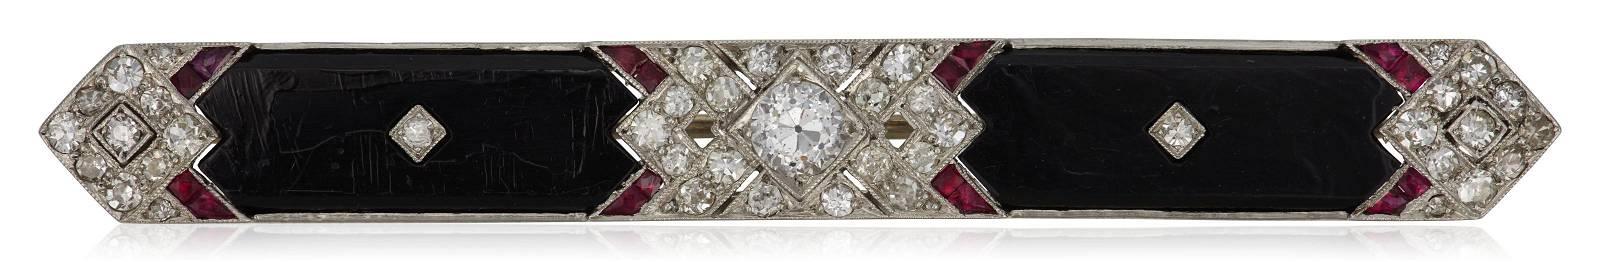 TIFFANY & CO. ART DECO DIAMOND, RUBY AND ONYX BROOCH